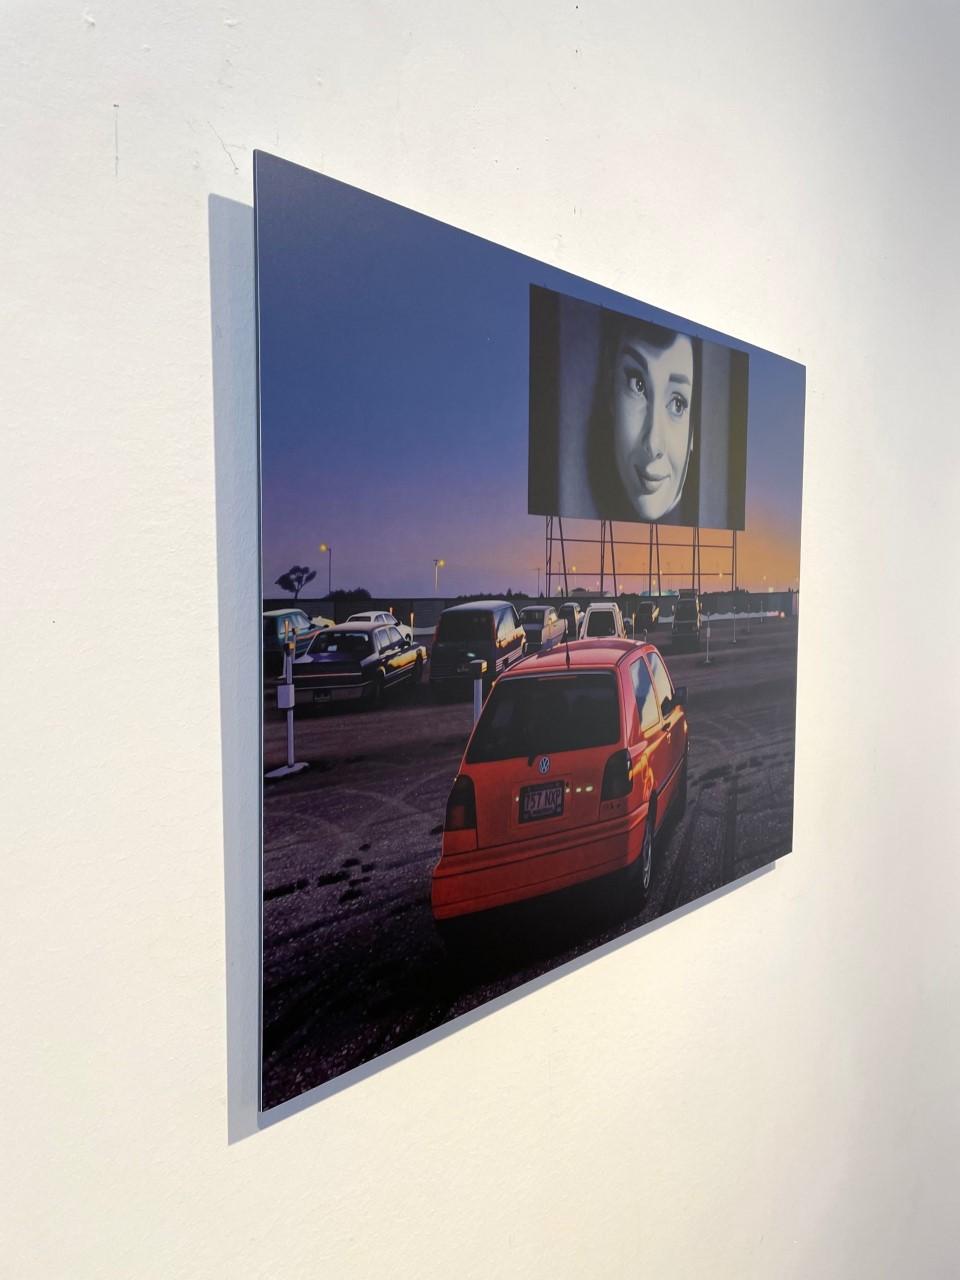 Andrew-Valko-Funny-Girl-2021-Archival-Pigment-Print-BackMounted-On-Aluminum-18x24-Online-Art-Galleries-side